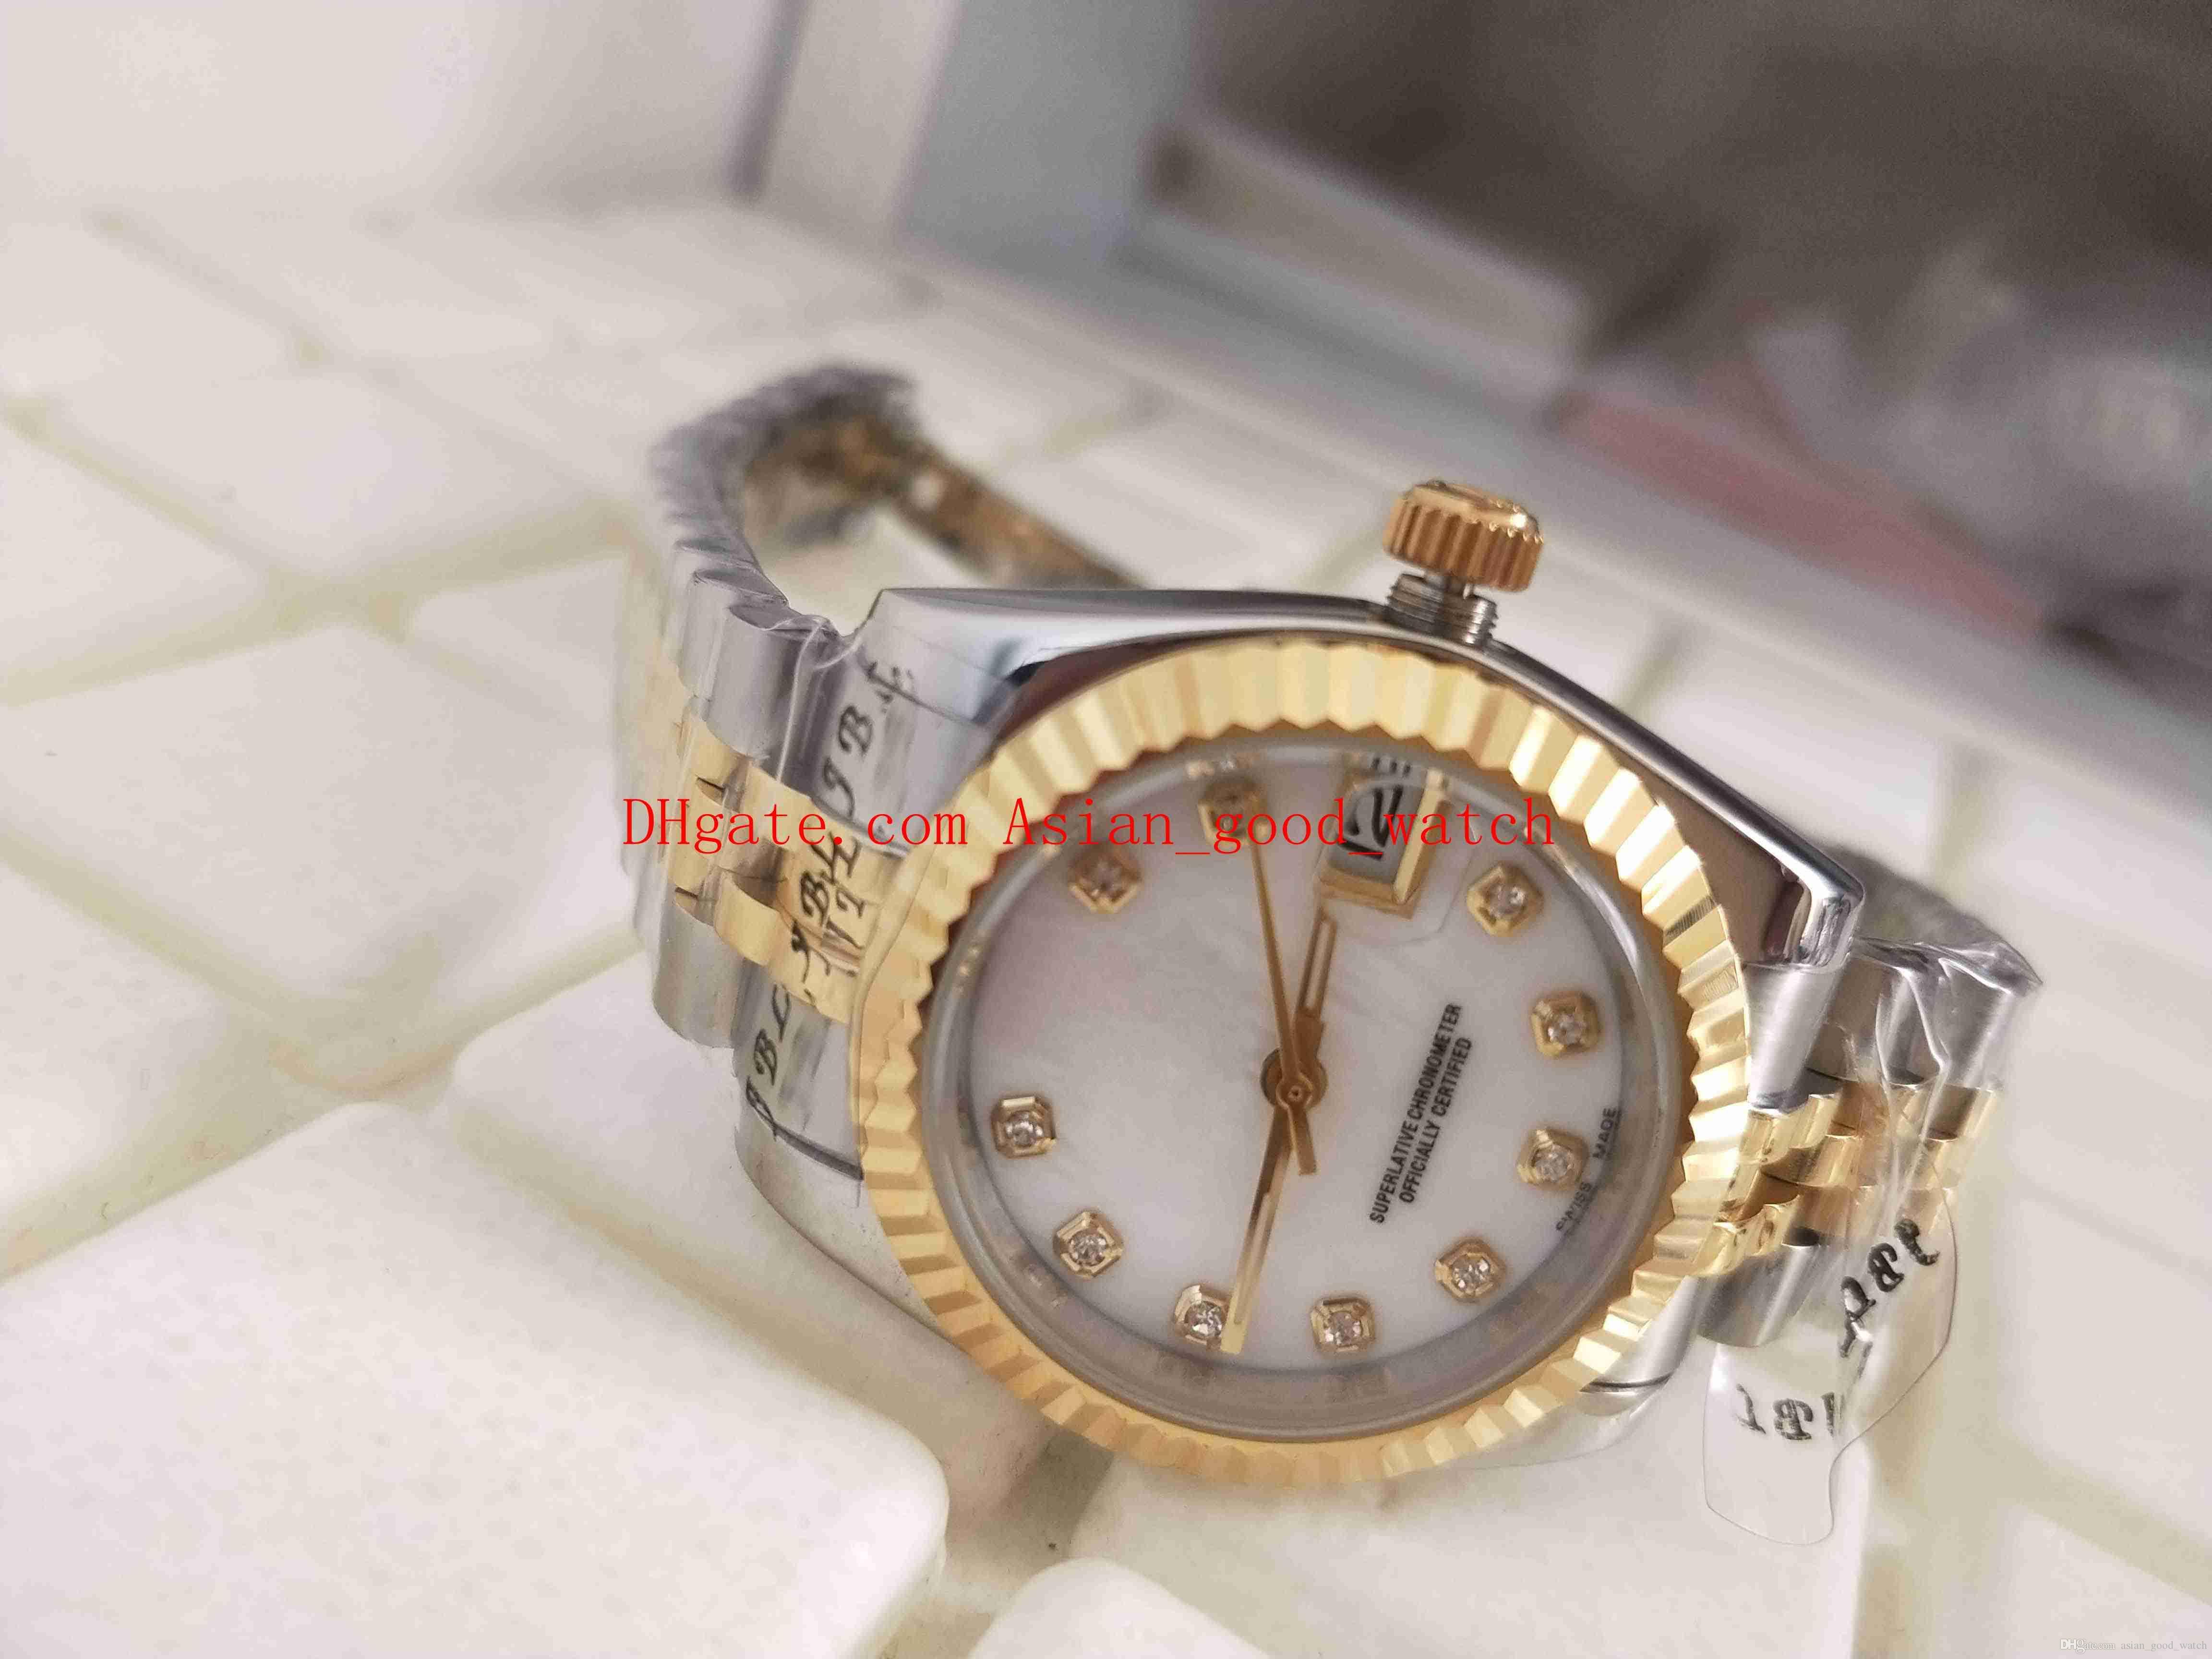 Envío gratis Moda para mujer wantch 36 MM 18 K oro amarillo 178384 Fecha de marcación blanca Reloj de mujer de zafiro de cristal en dos tonos de oro automático